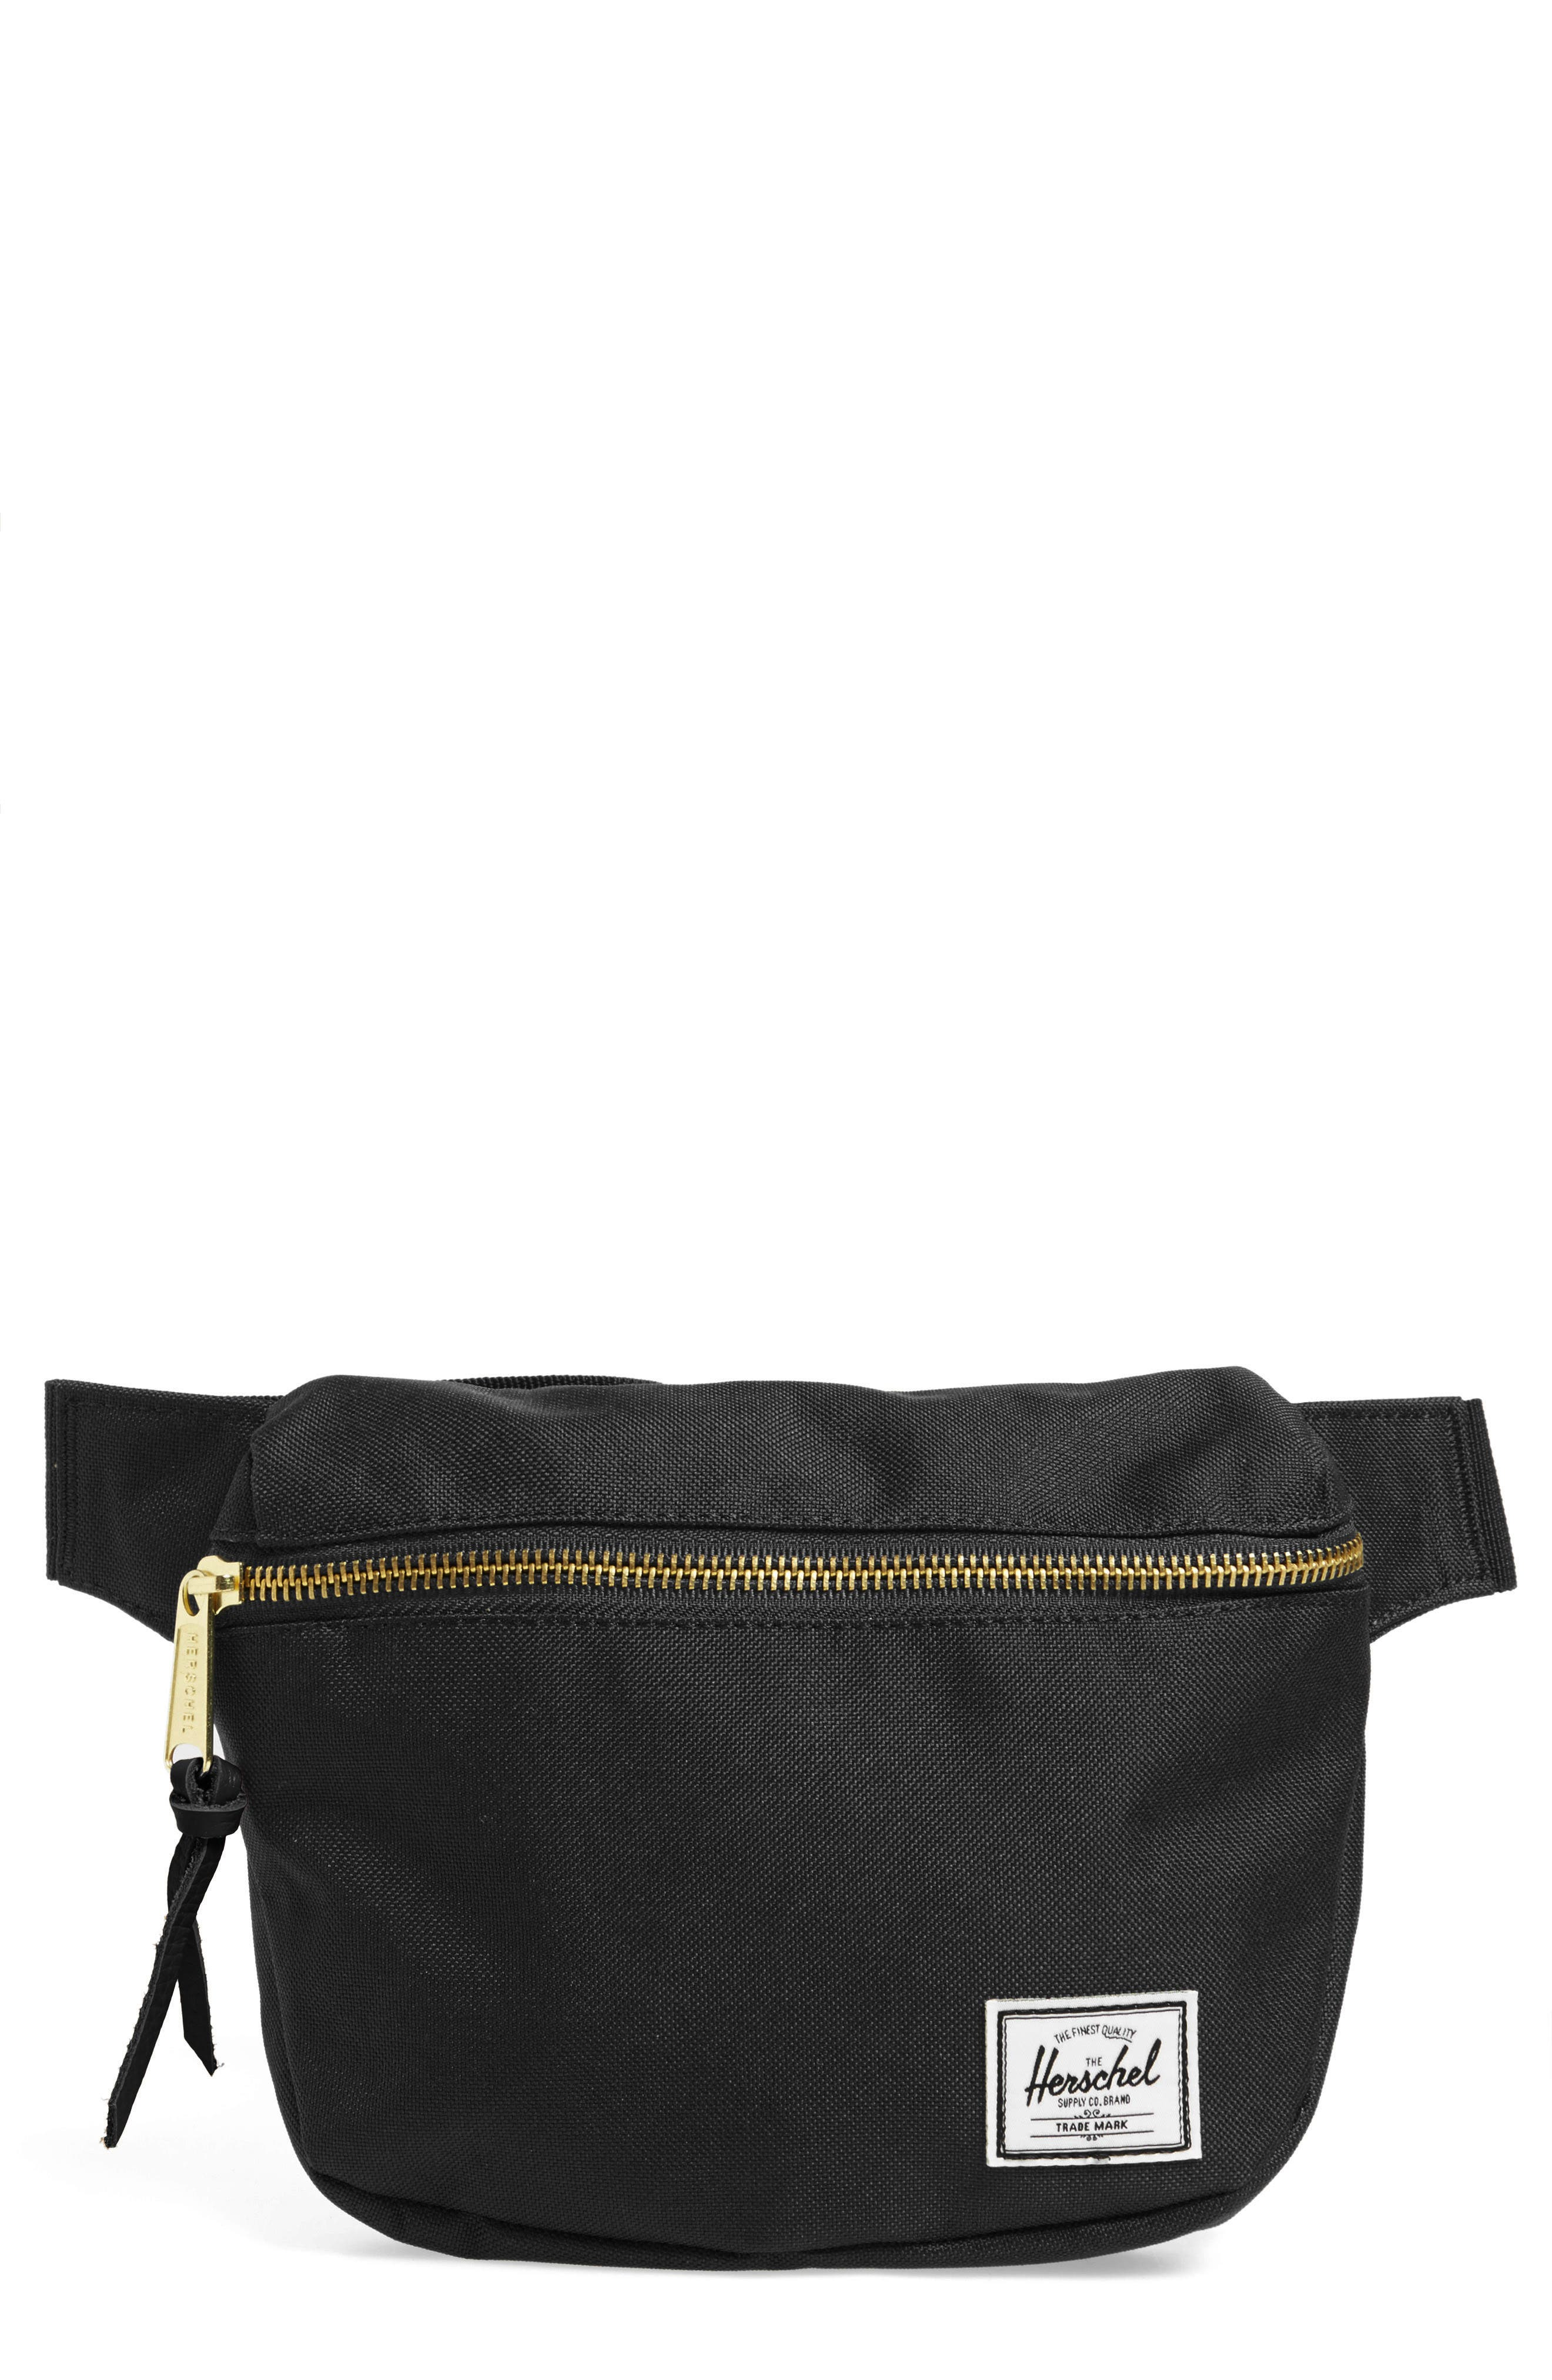 4fe50468a46 Herschel Supply Co. Crossbody Bags